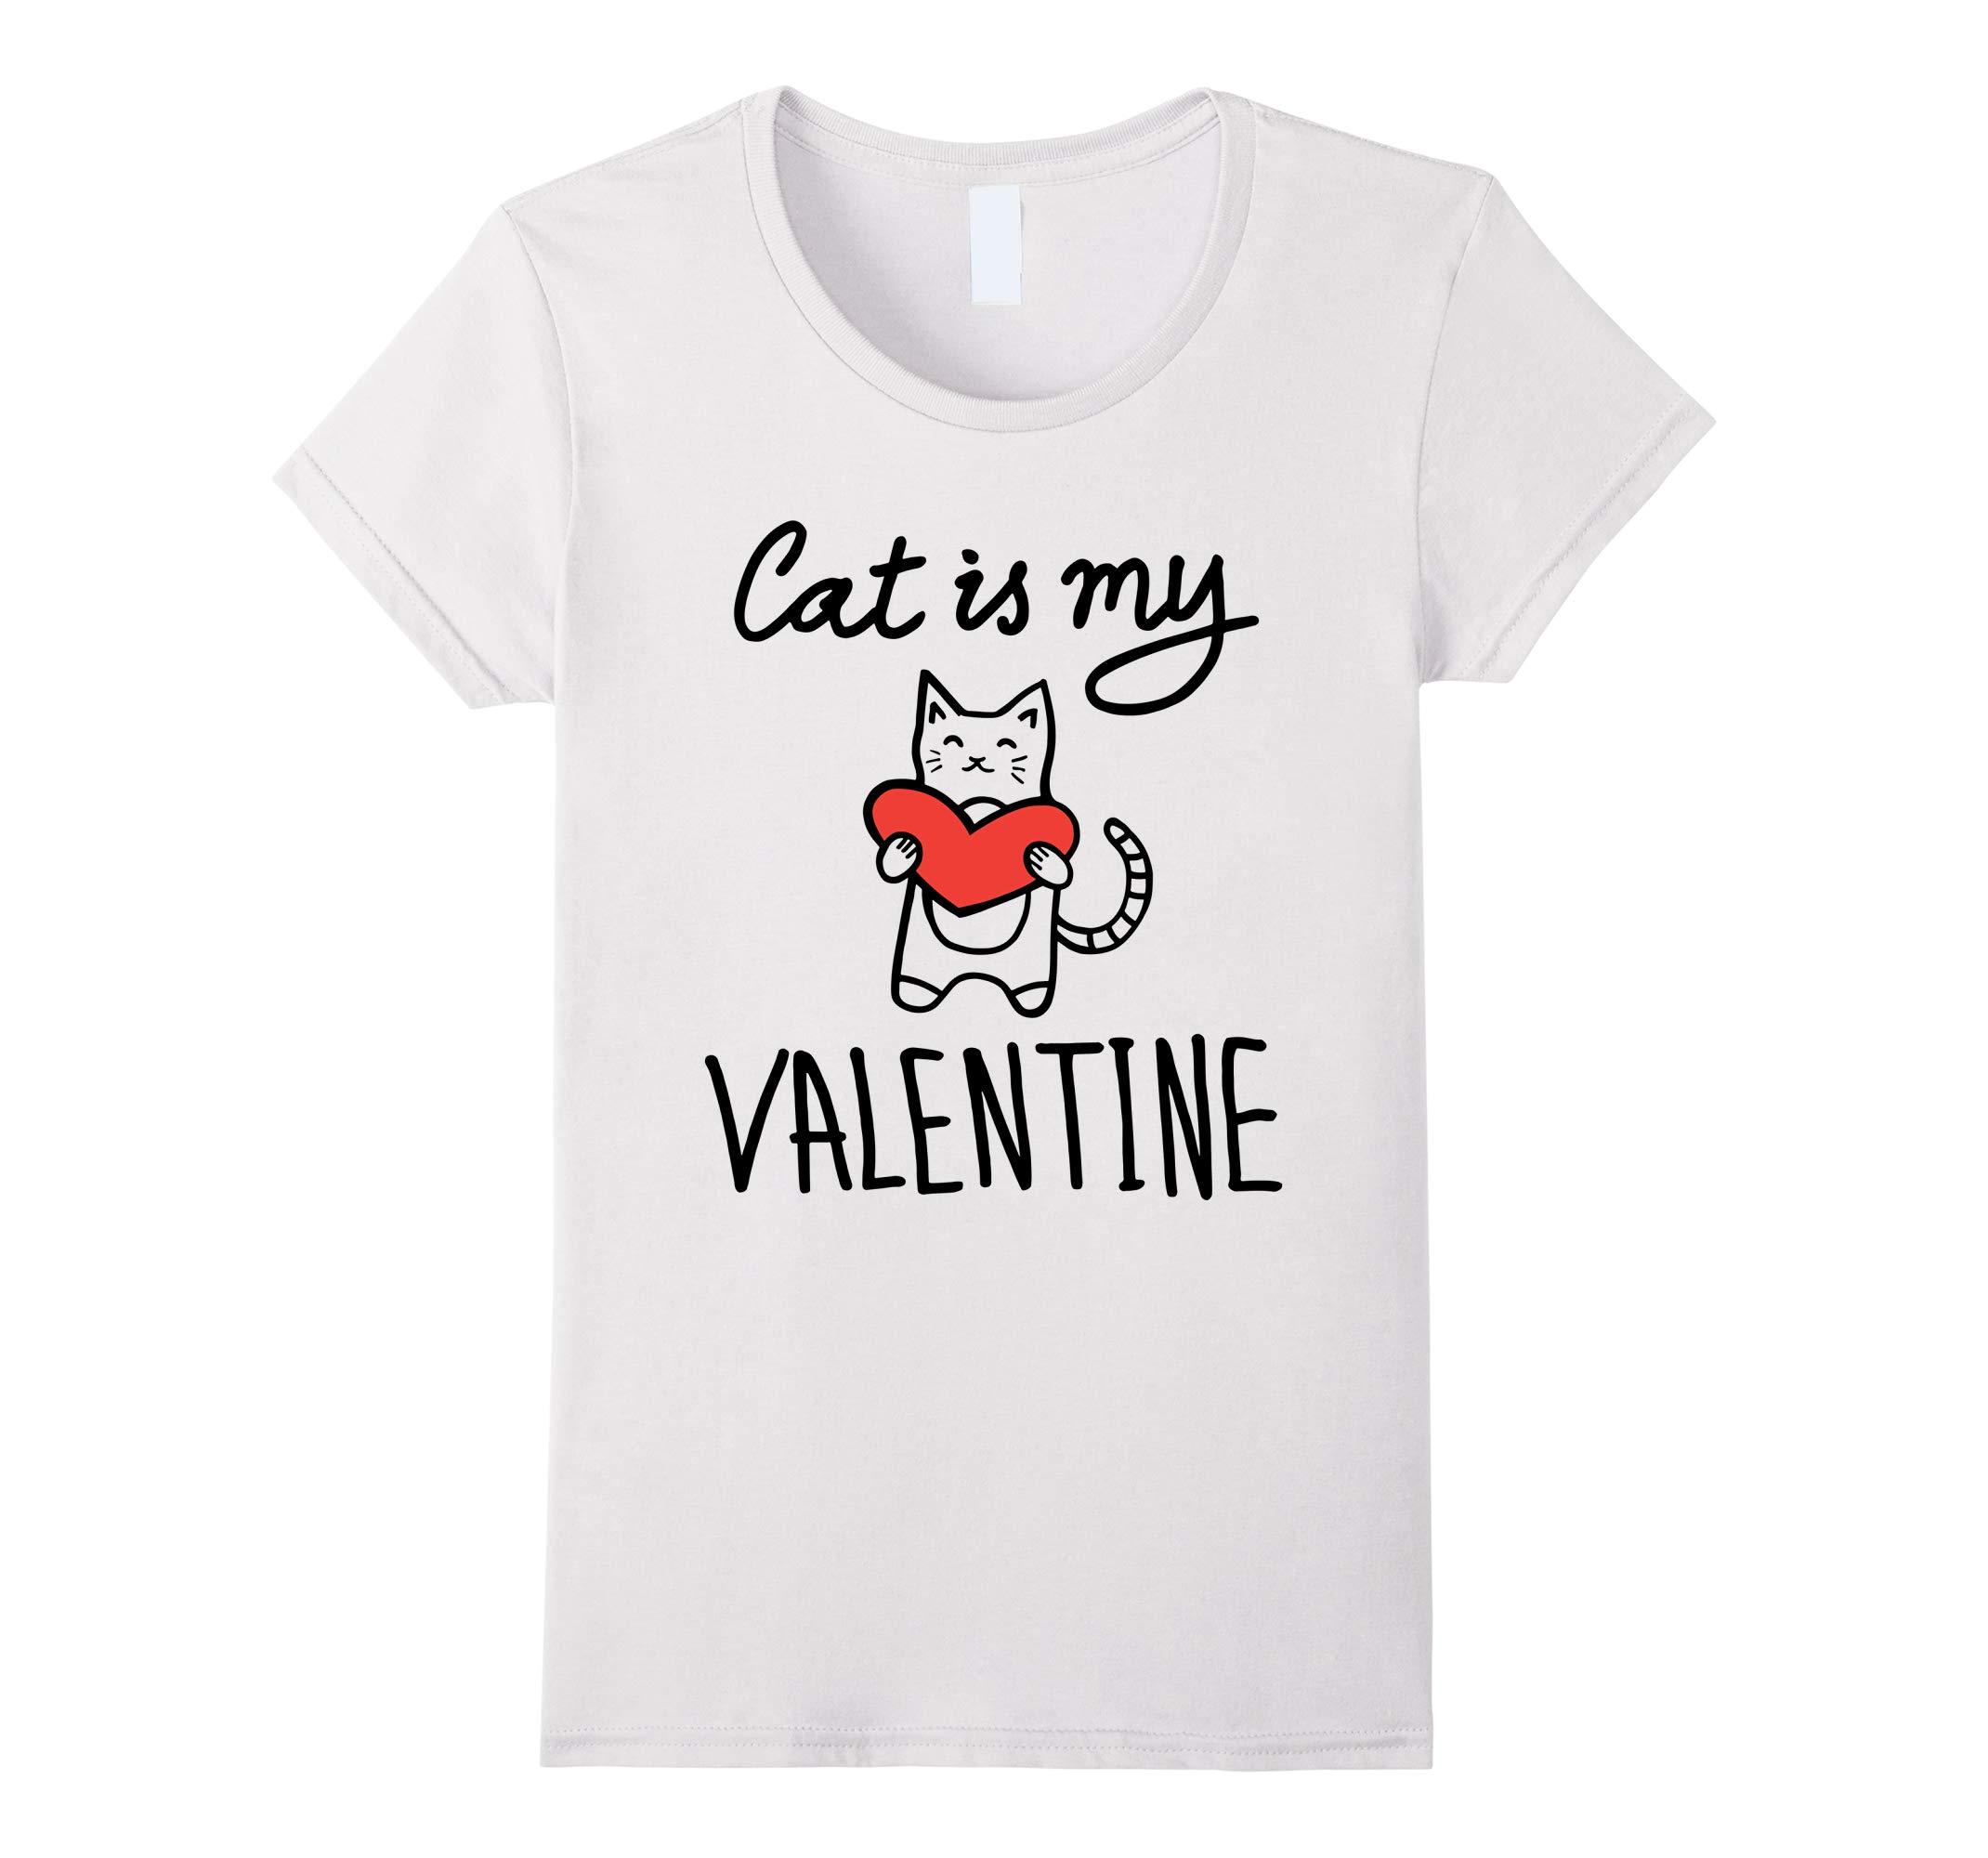 Valentines Day T Shirt - Cat is My Valentine Heart Tshirt-RT